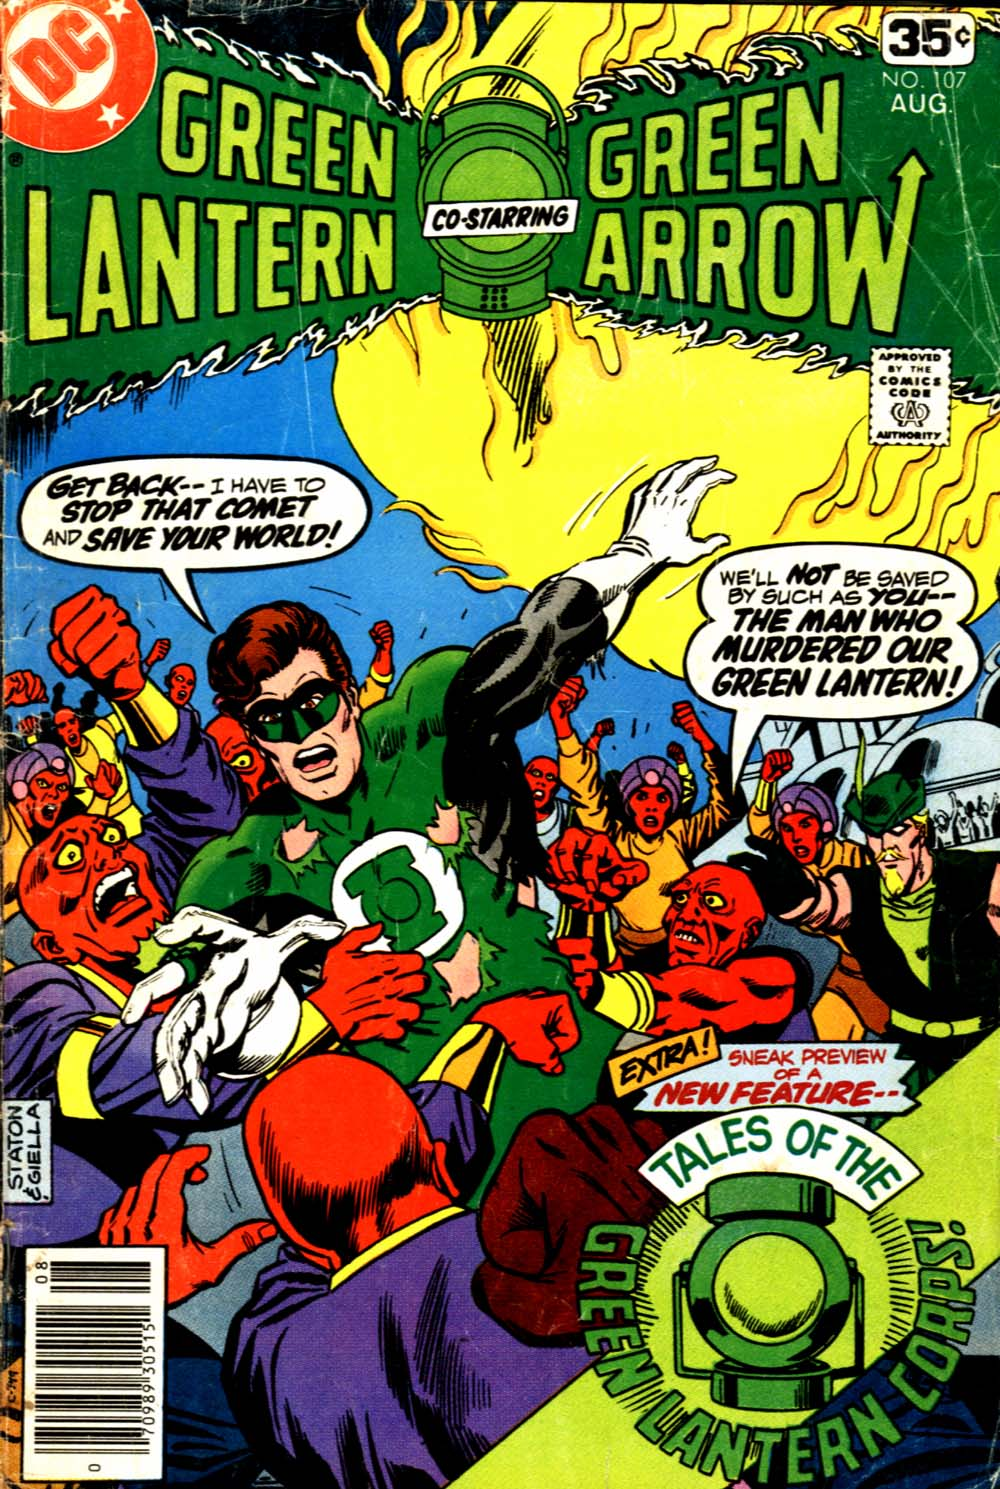 Green Lantern (1960) #107, cover penciled by Joe Staton & inked by Joe Giella.